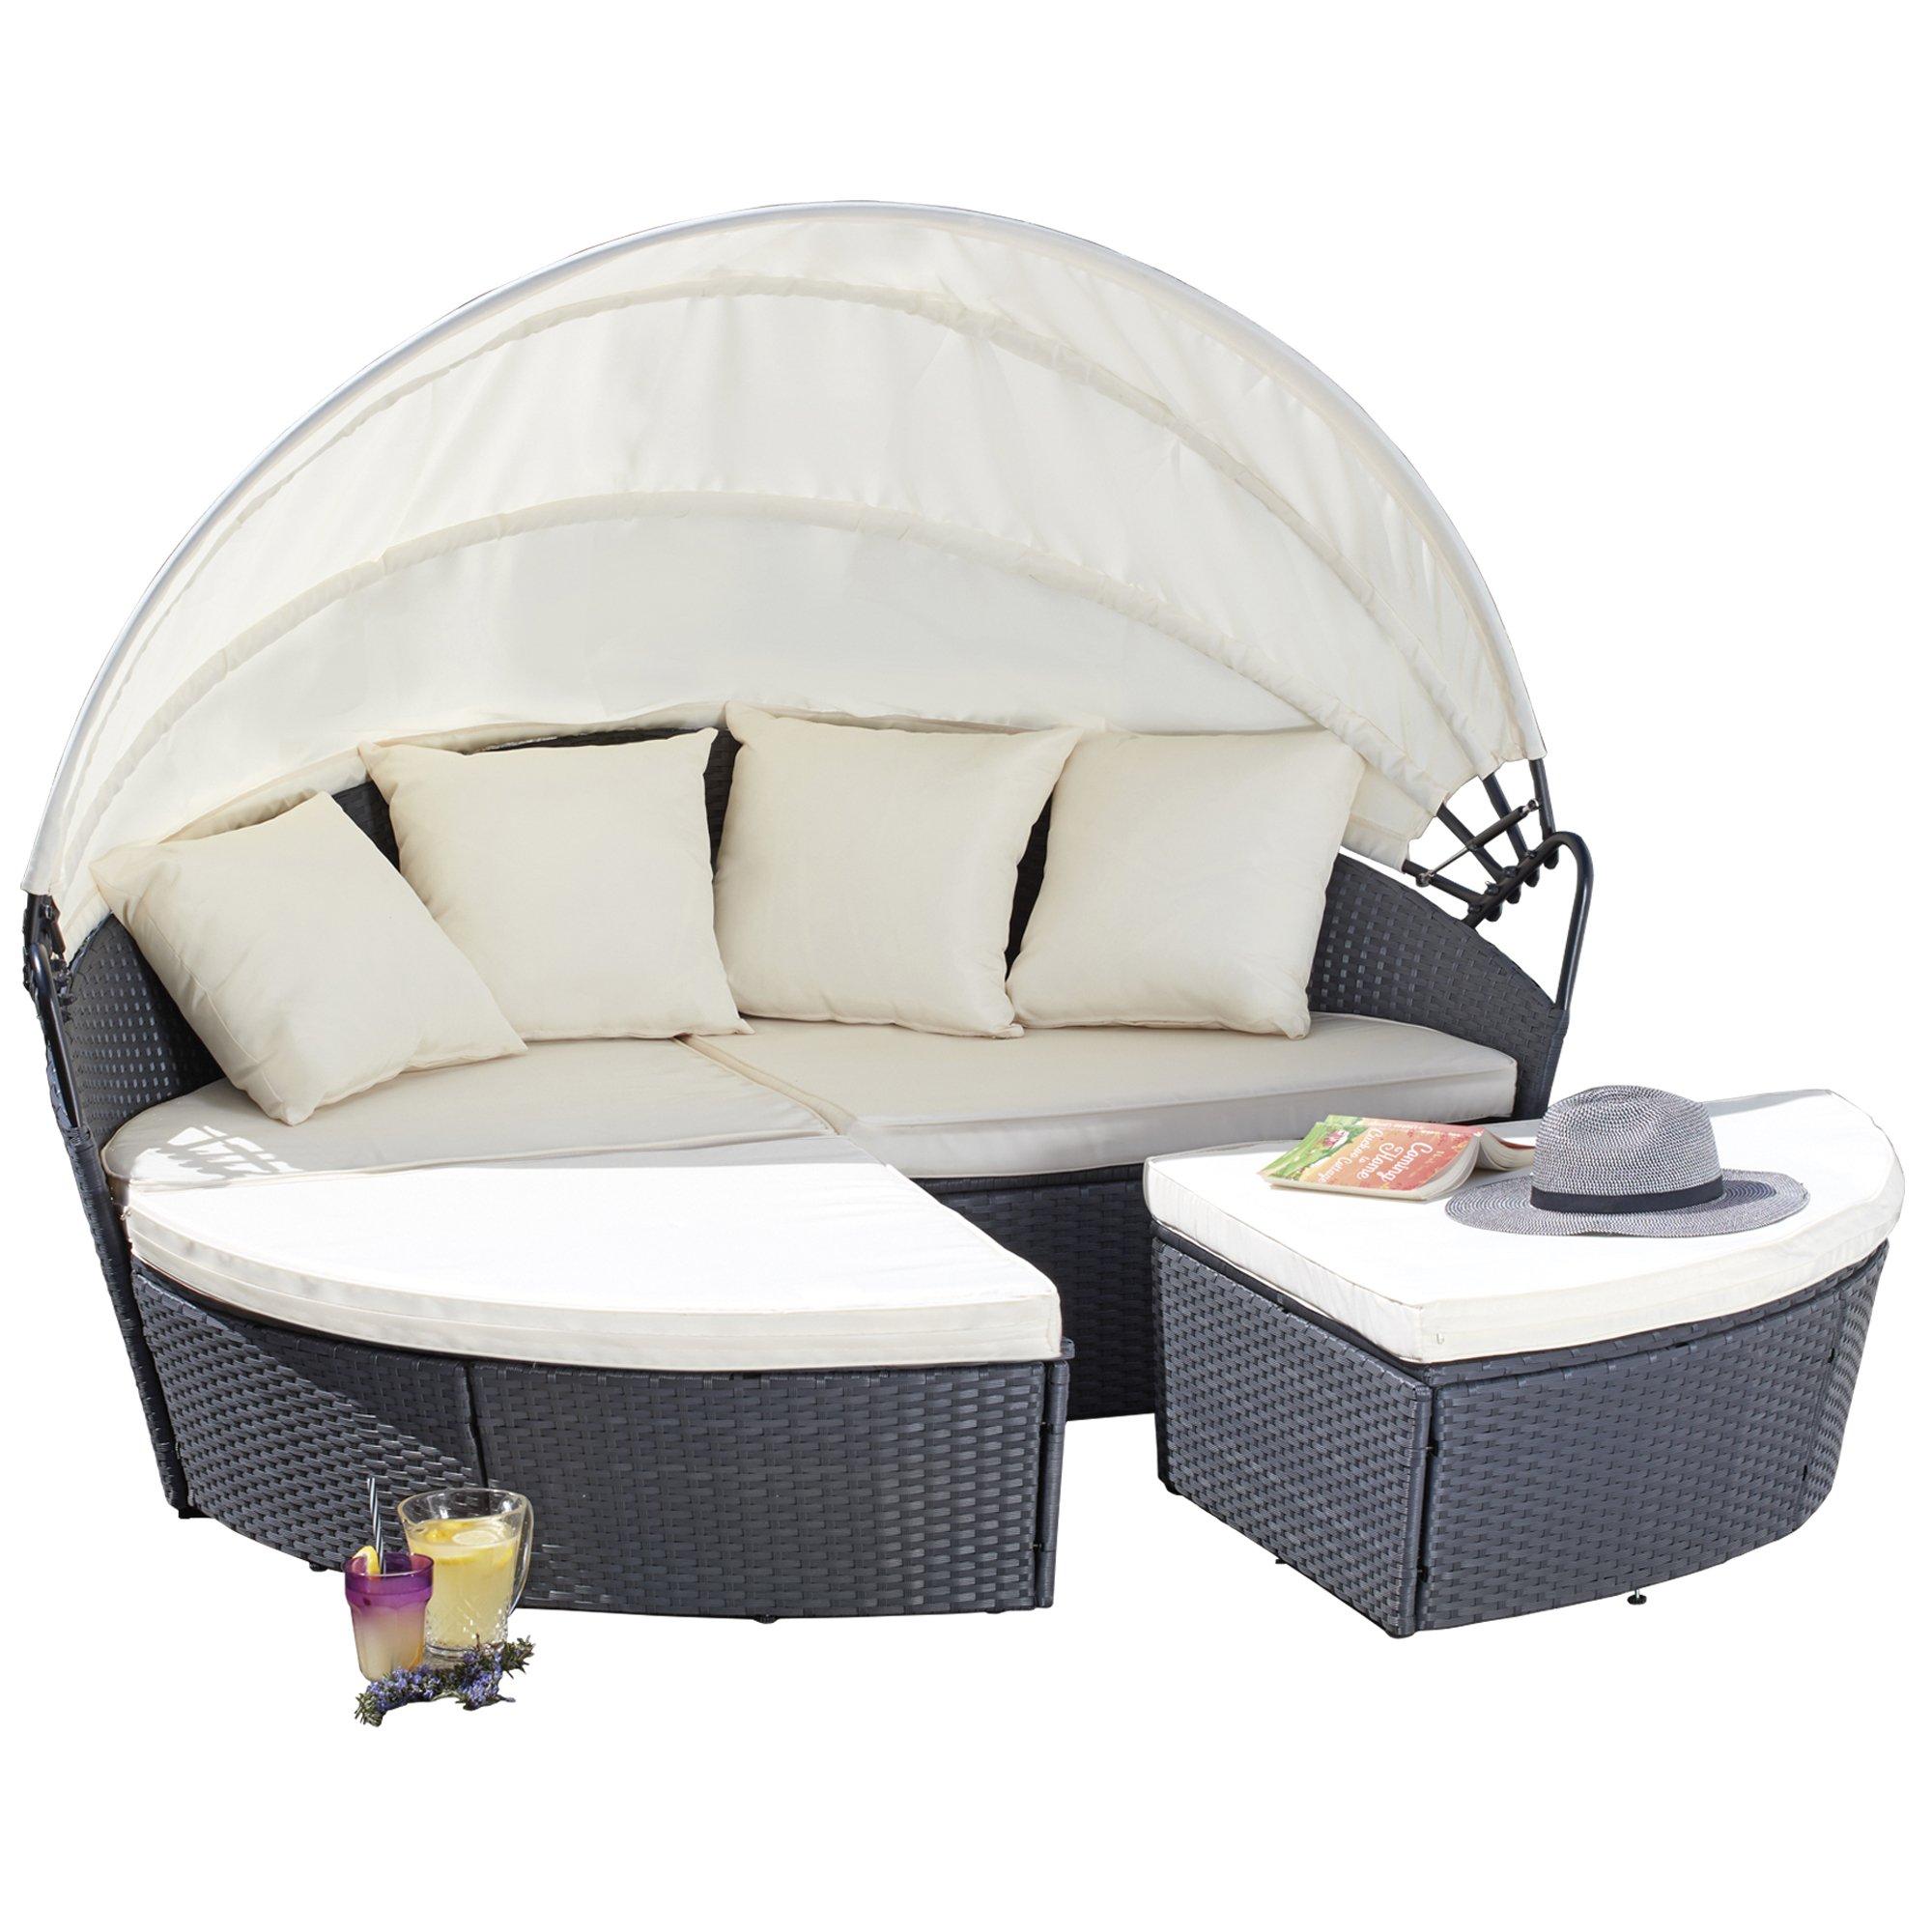 - Garden Gear 180cm 3 Piece Rattan Daybed Outdoor Furniture Set With